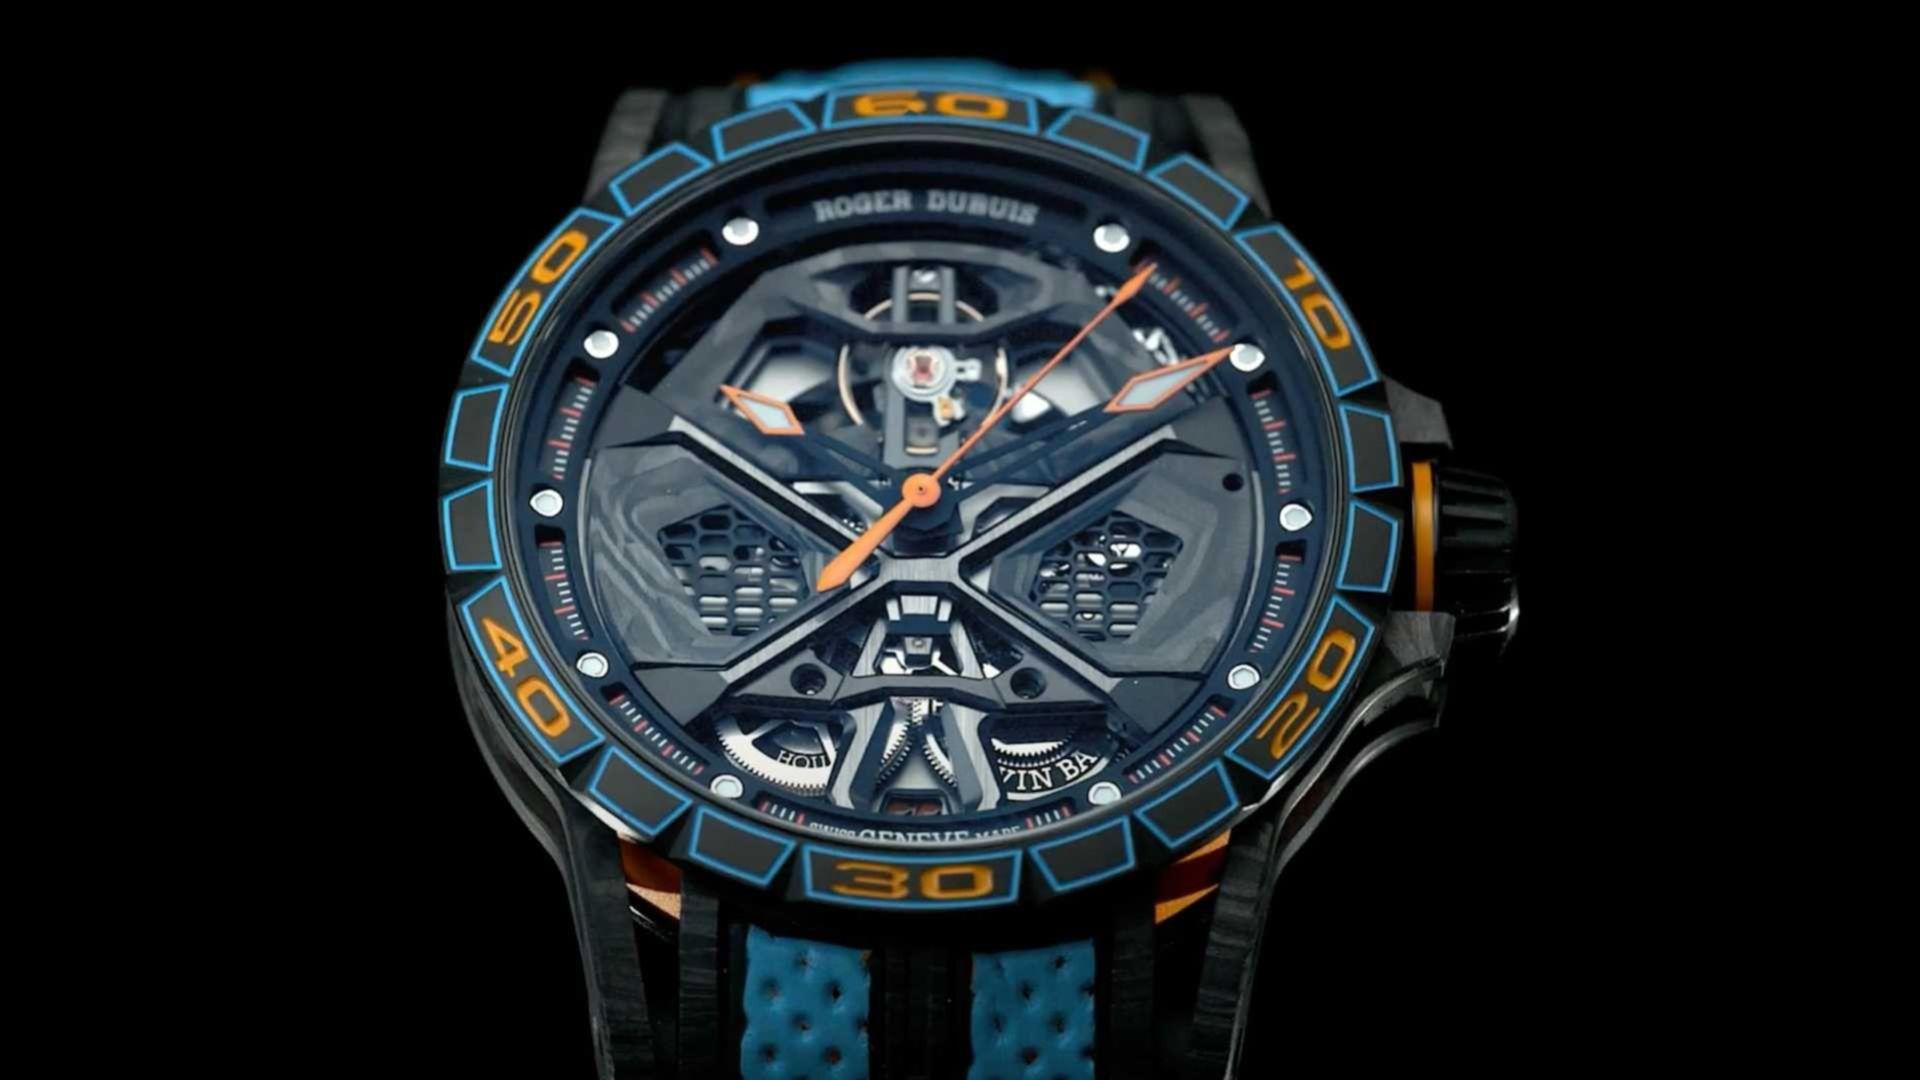 Ny Lamborghini-klocka från Roger Dubuis